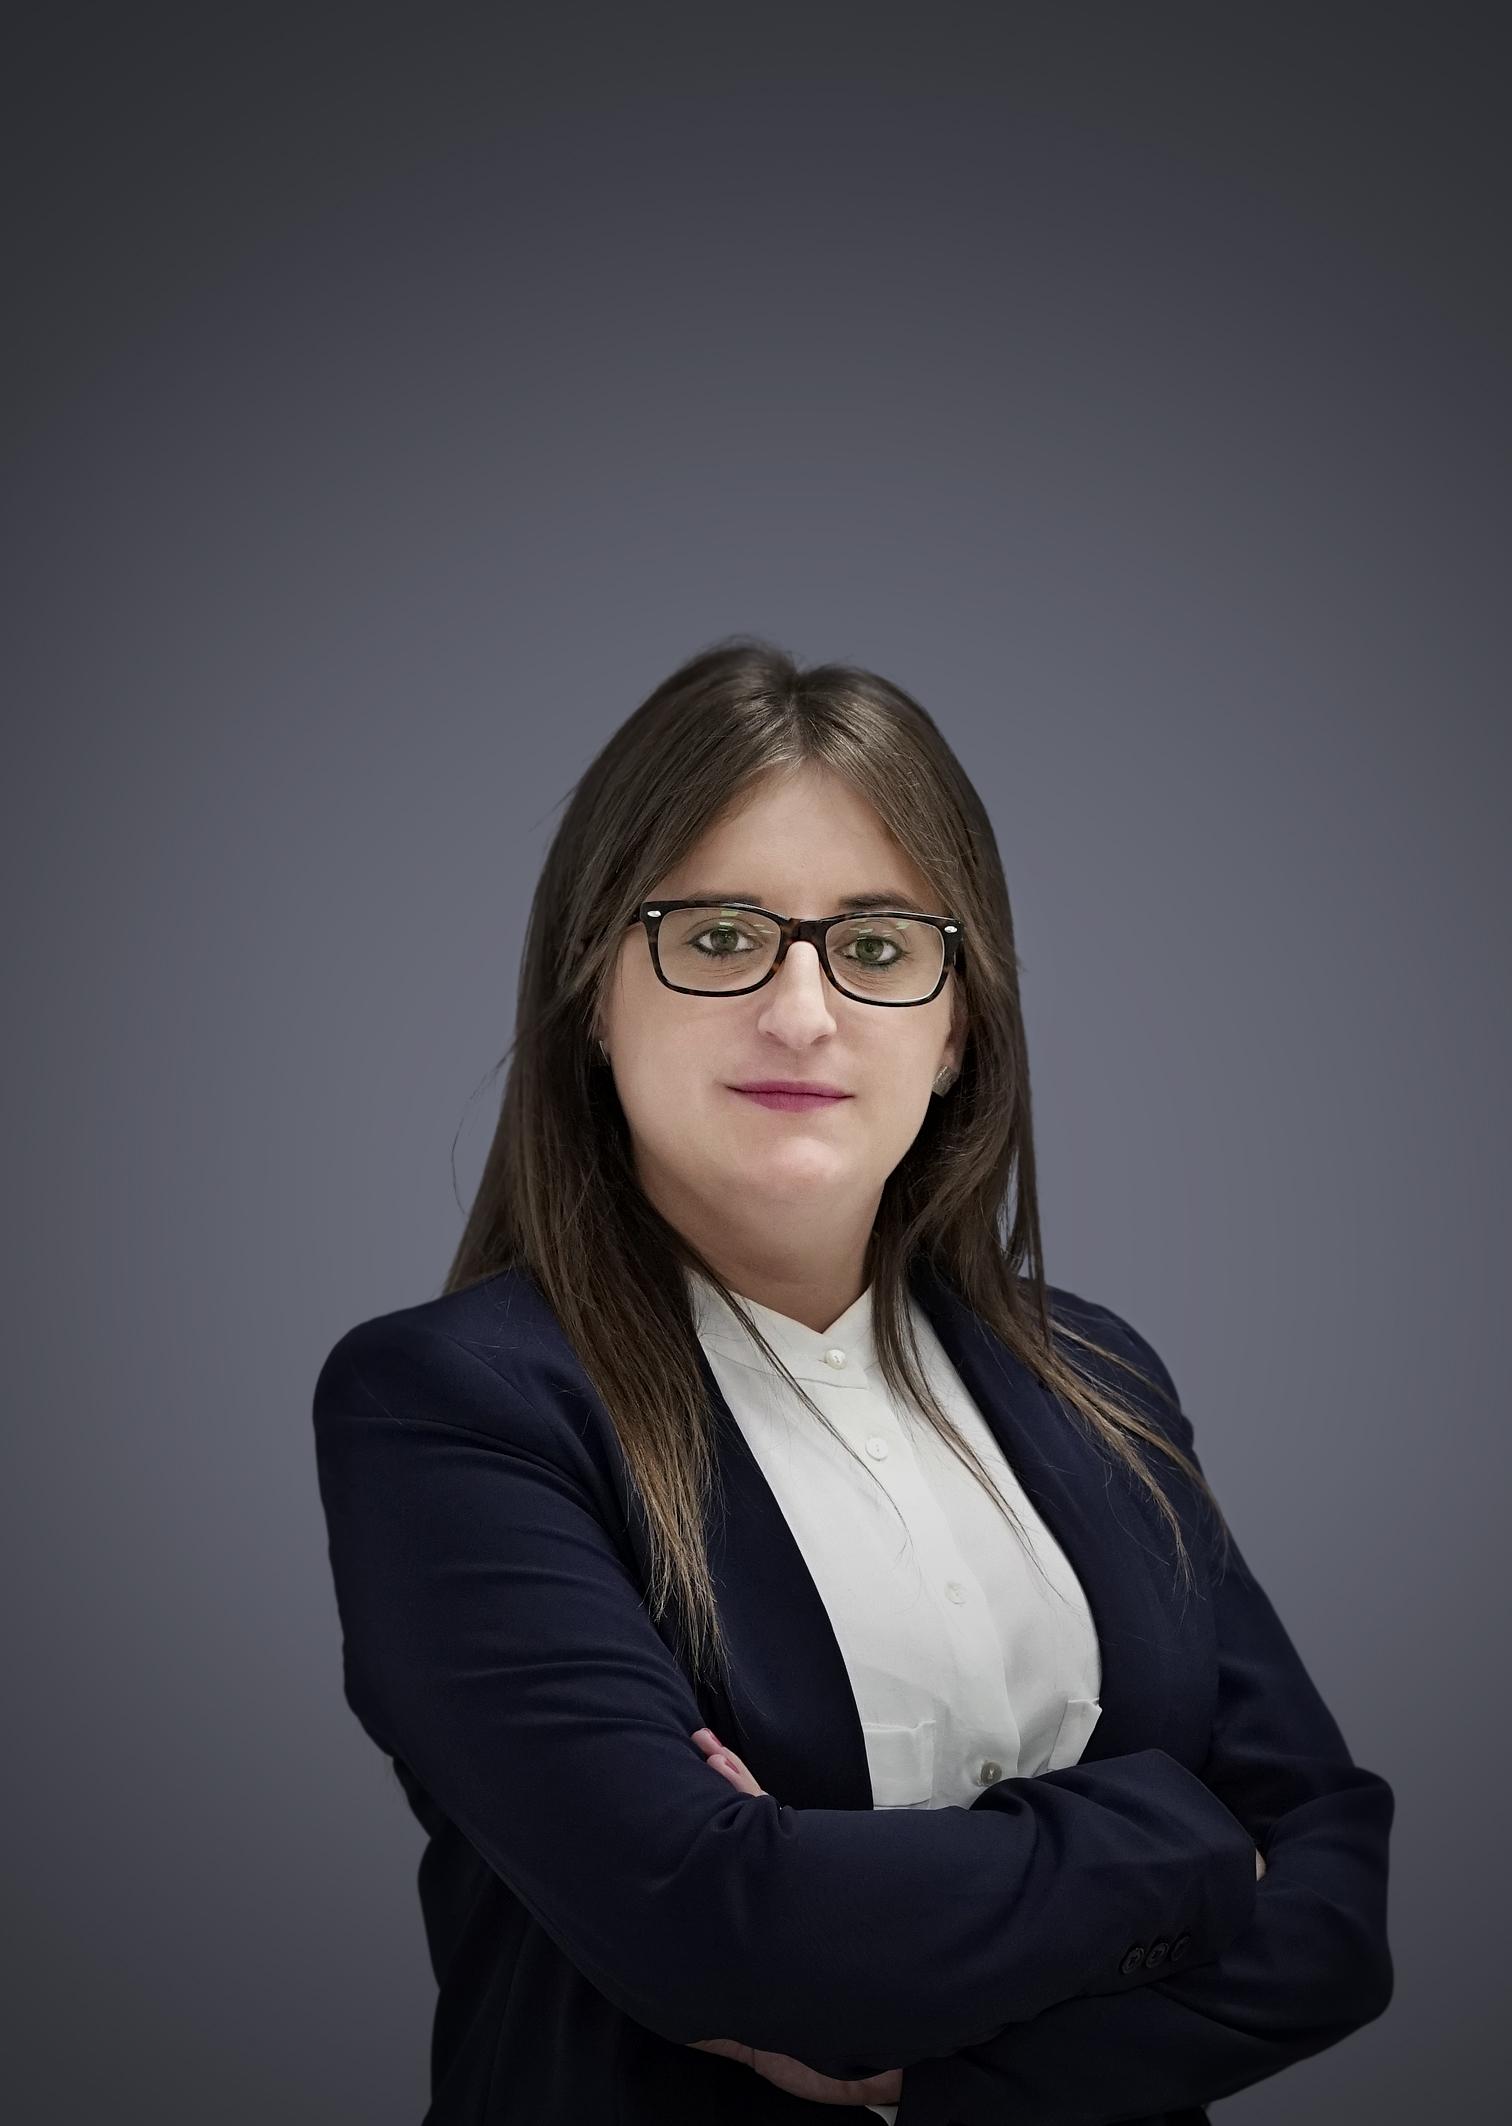 Laura Albir Herrero